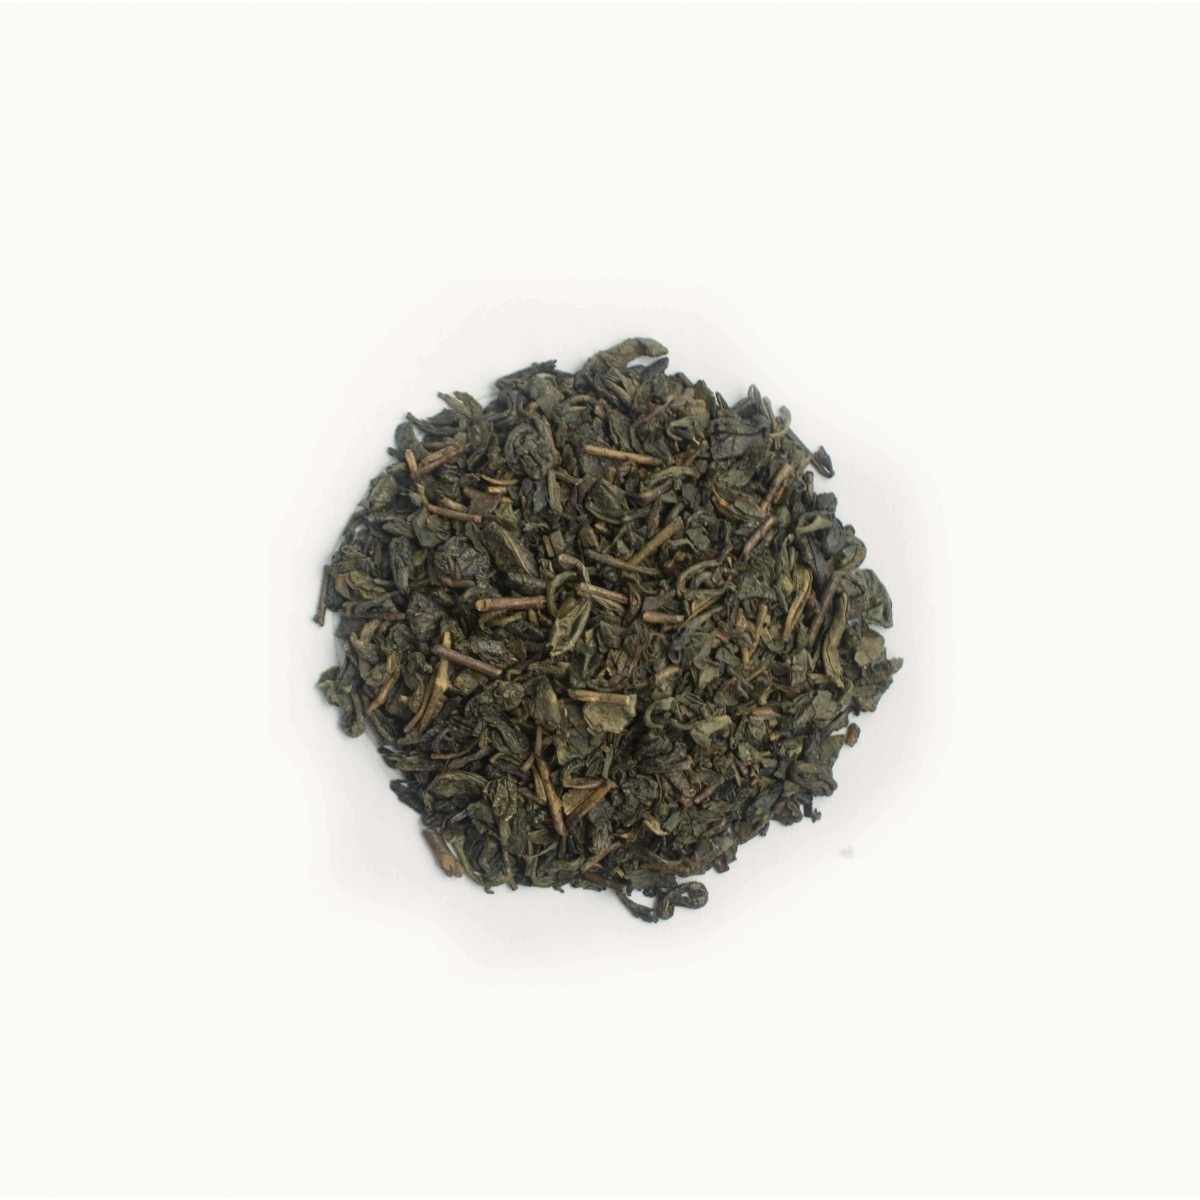 CHÁ VERDE - Camellia sinensis - 50g